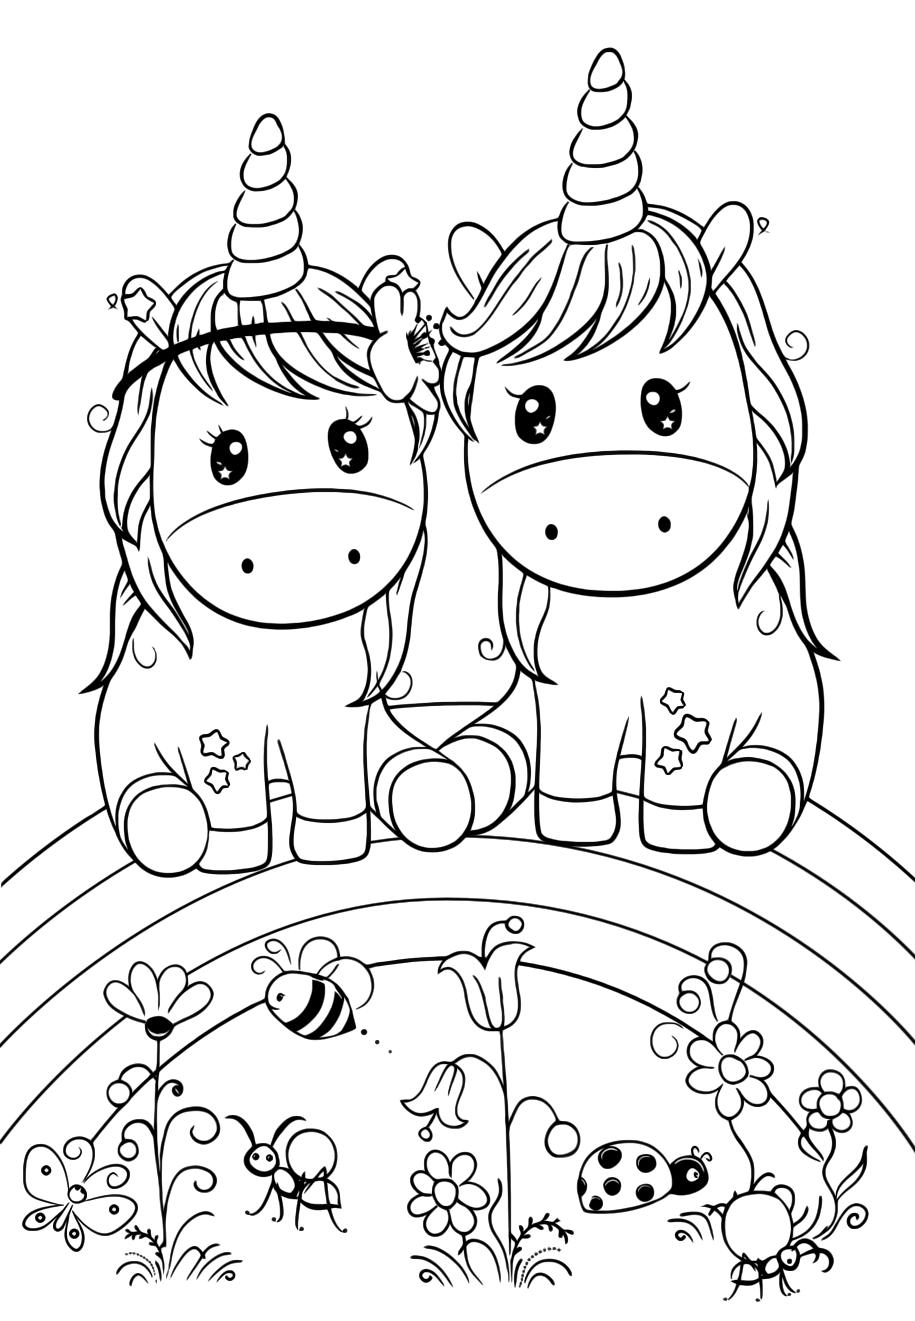 Cuties a couple of unicorns